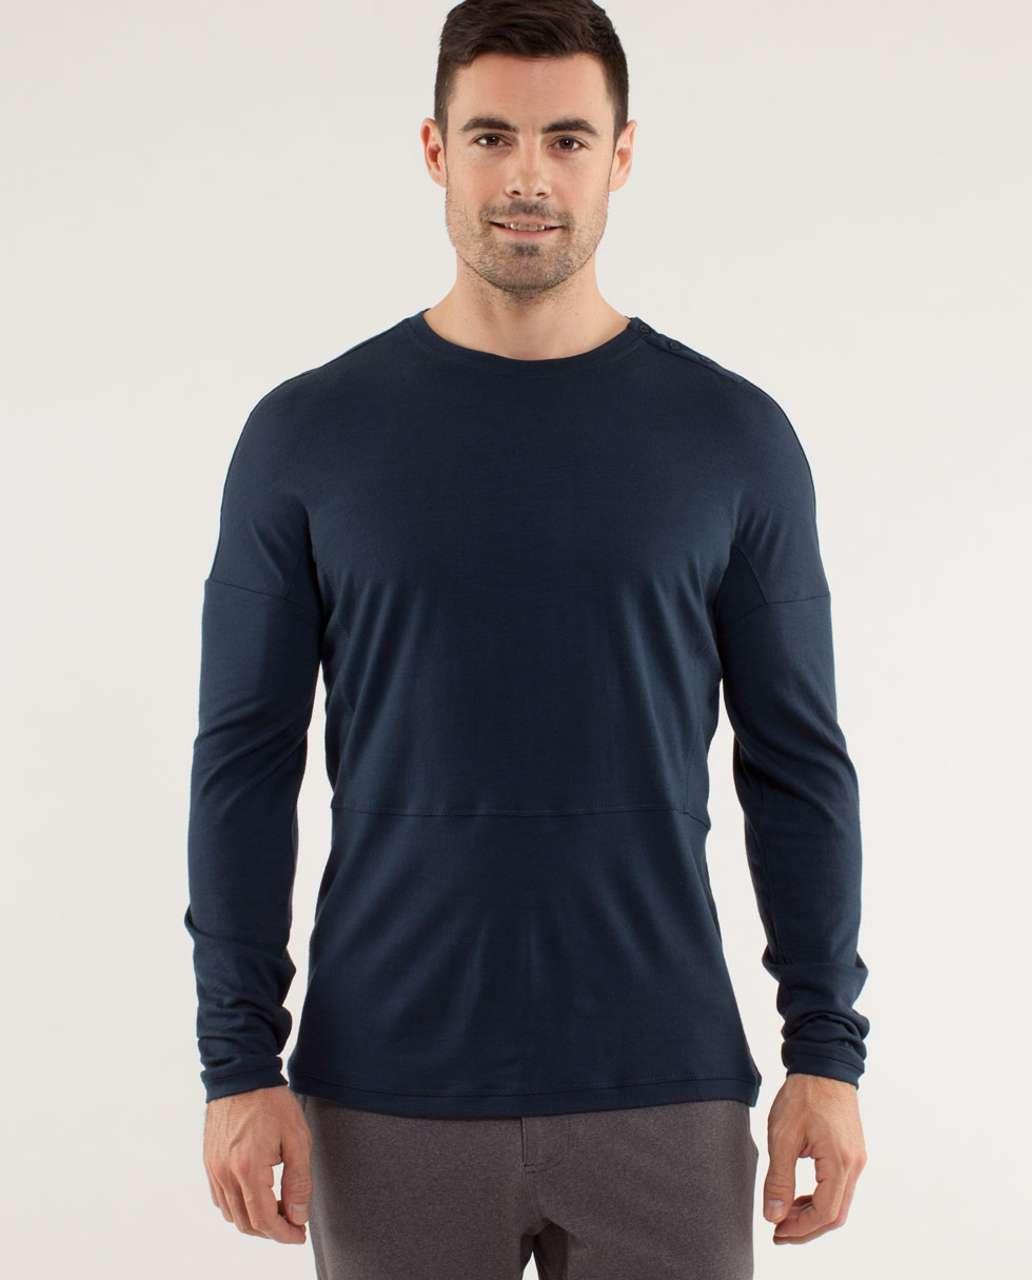 Lululemon Transit Long Sleeve *Merino Wool - Black Iris Blue